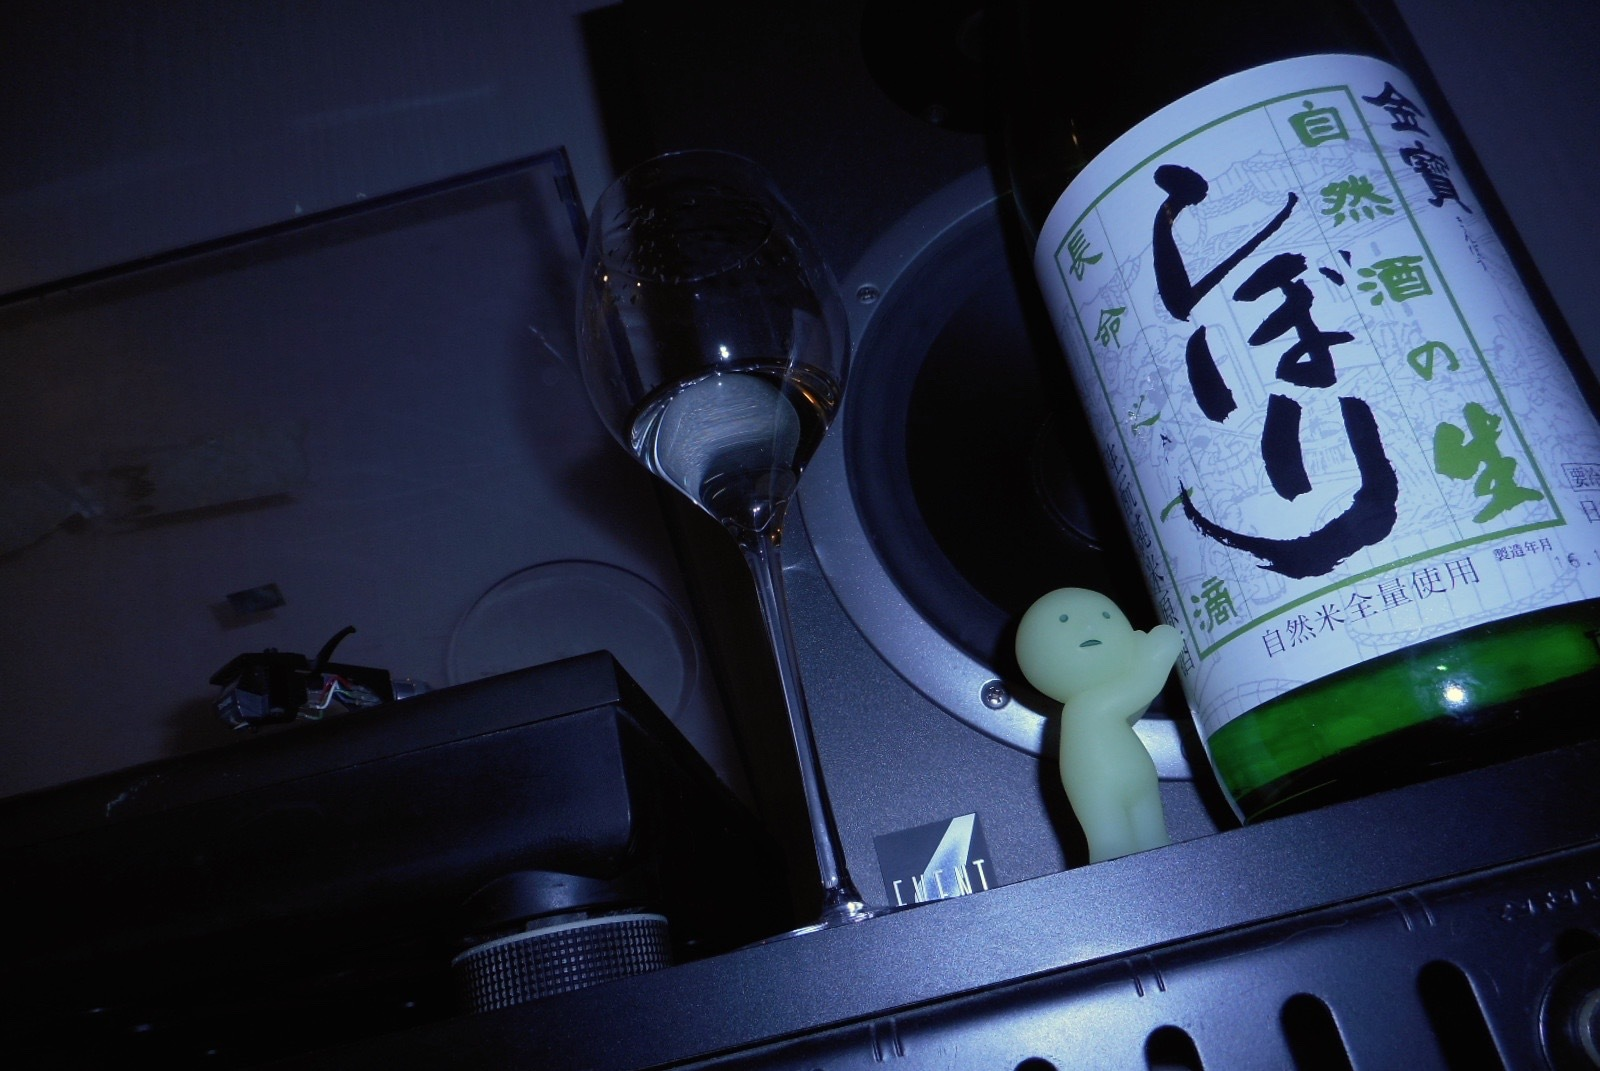 sizenshu_namashibori28by15.jpg